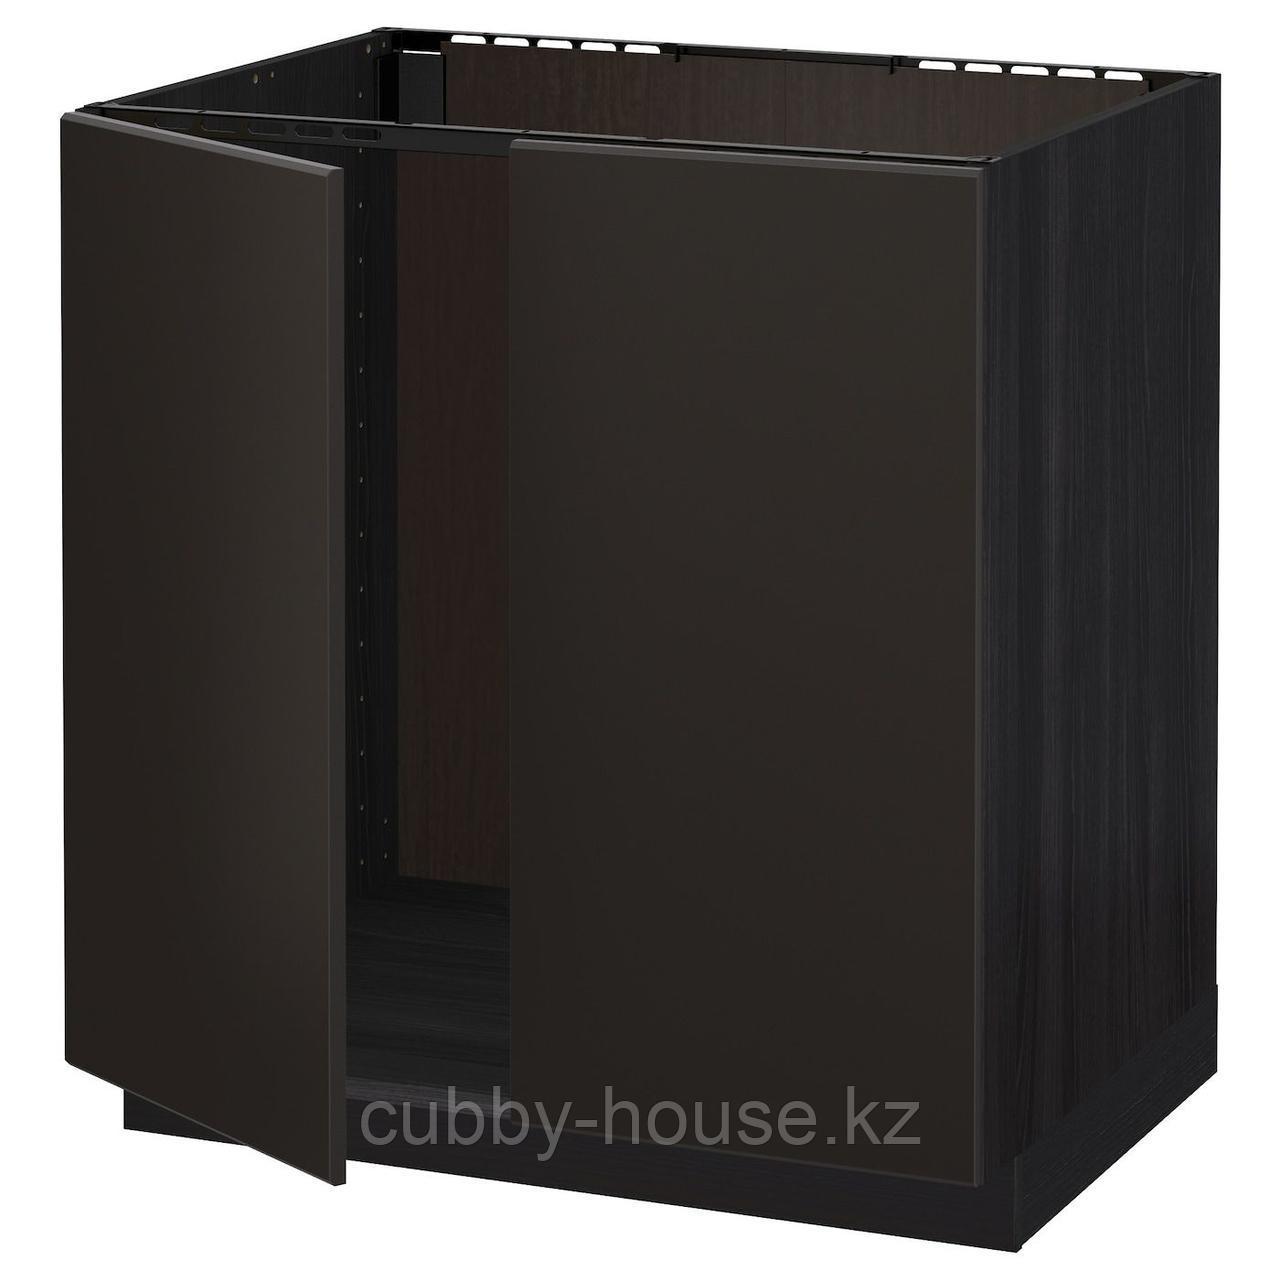 МЕТОД Напольн шкаф д раковины+2 двери, белый, Кунгсбакка антрацит, 80x60 см